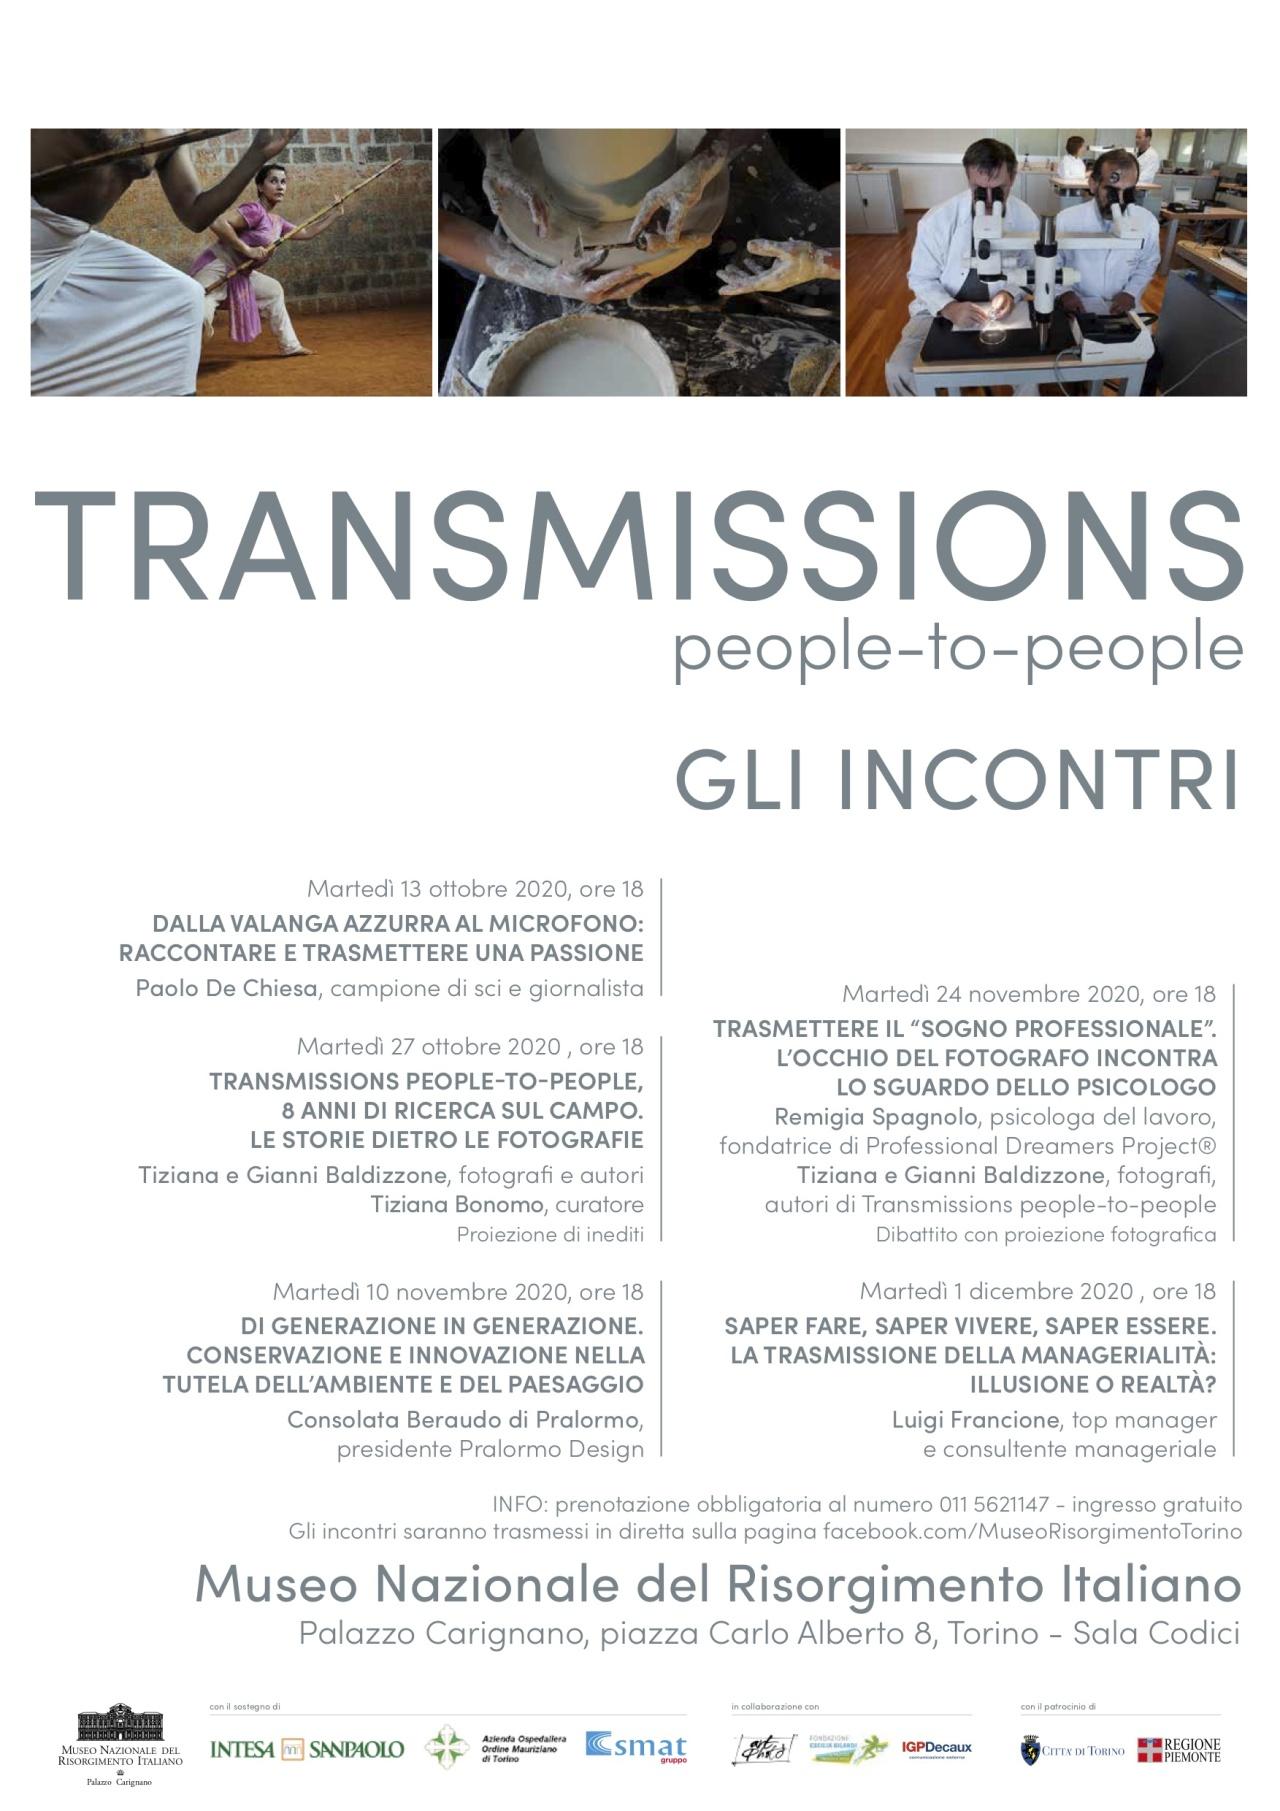 9ott2020_Mostra_Transmissions___INCONTRI_def.jpg